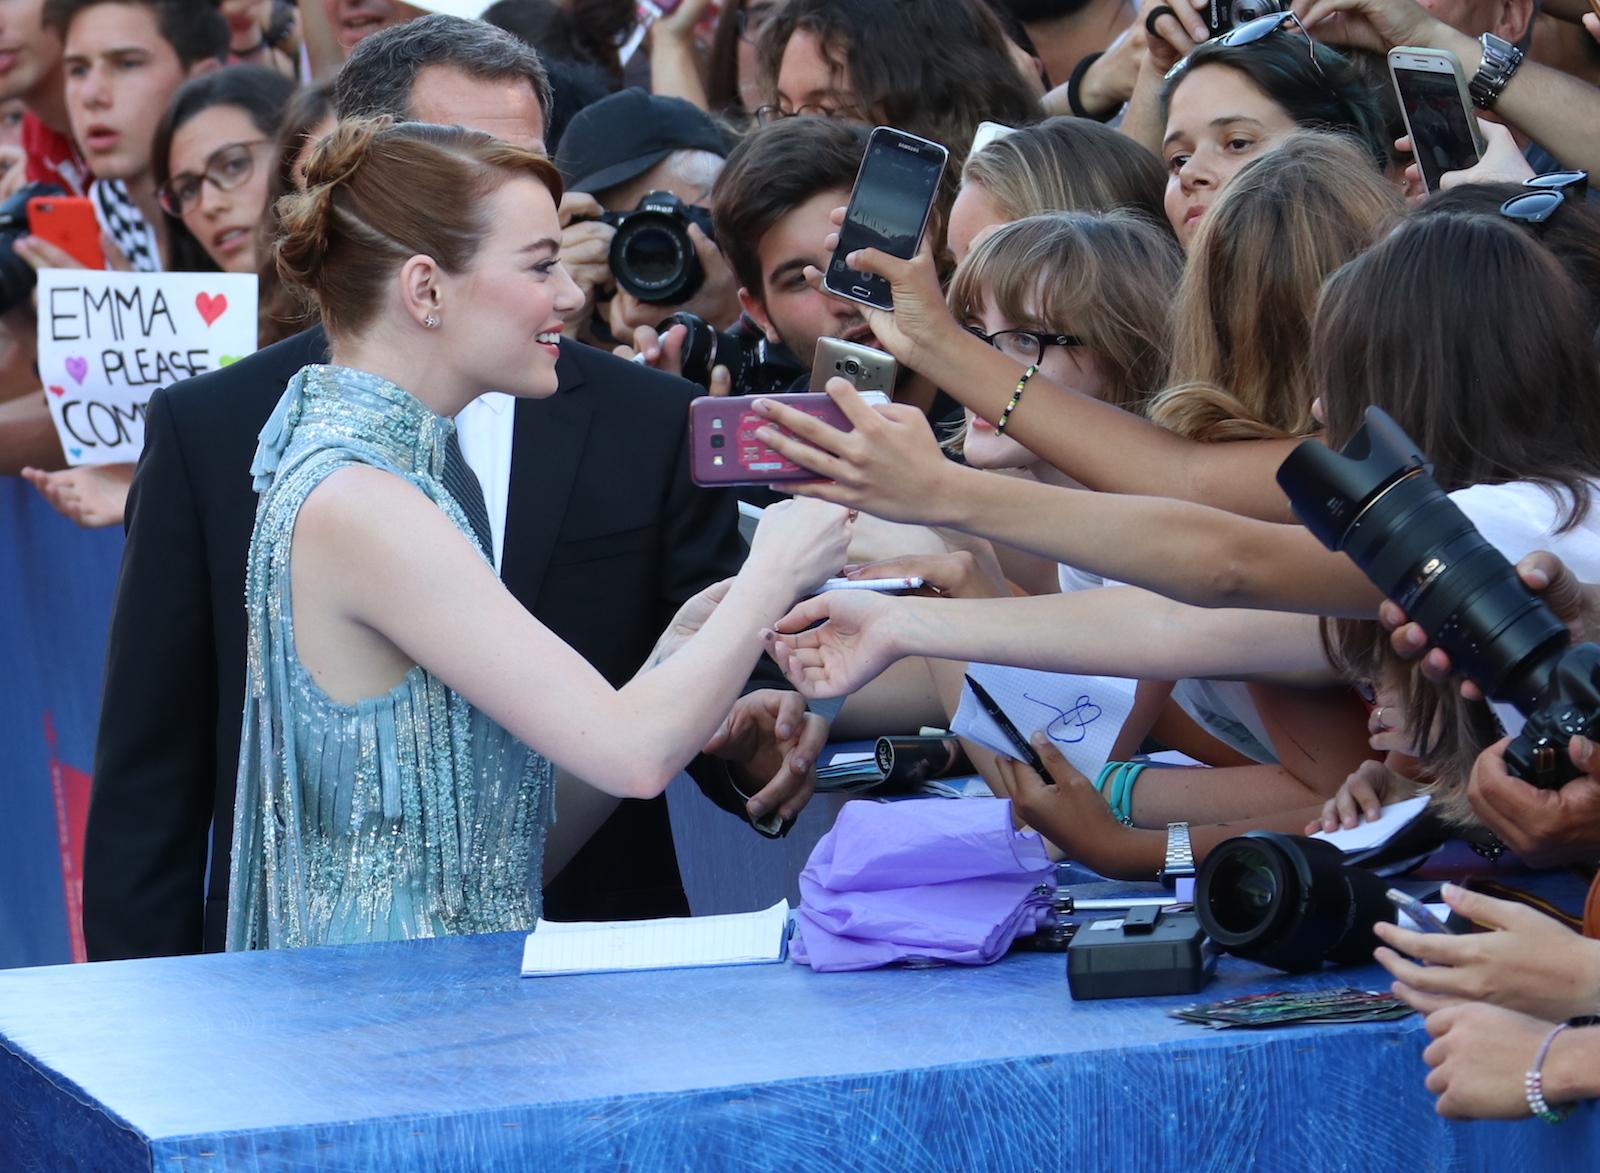 Venezia 2016: Emma Stone firma autografi sul red carpet